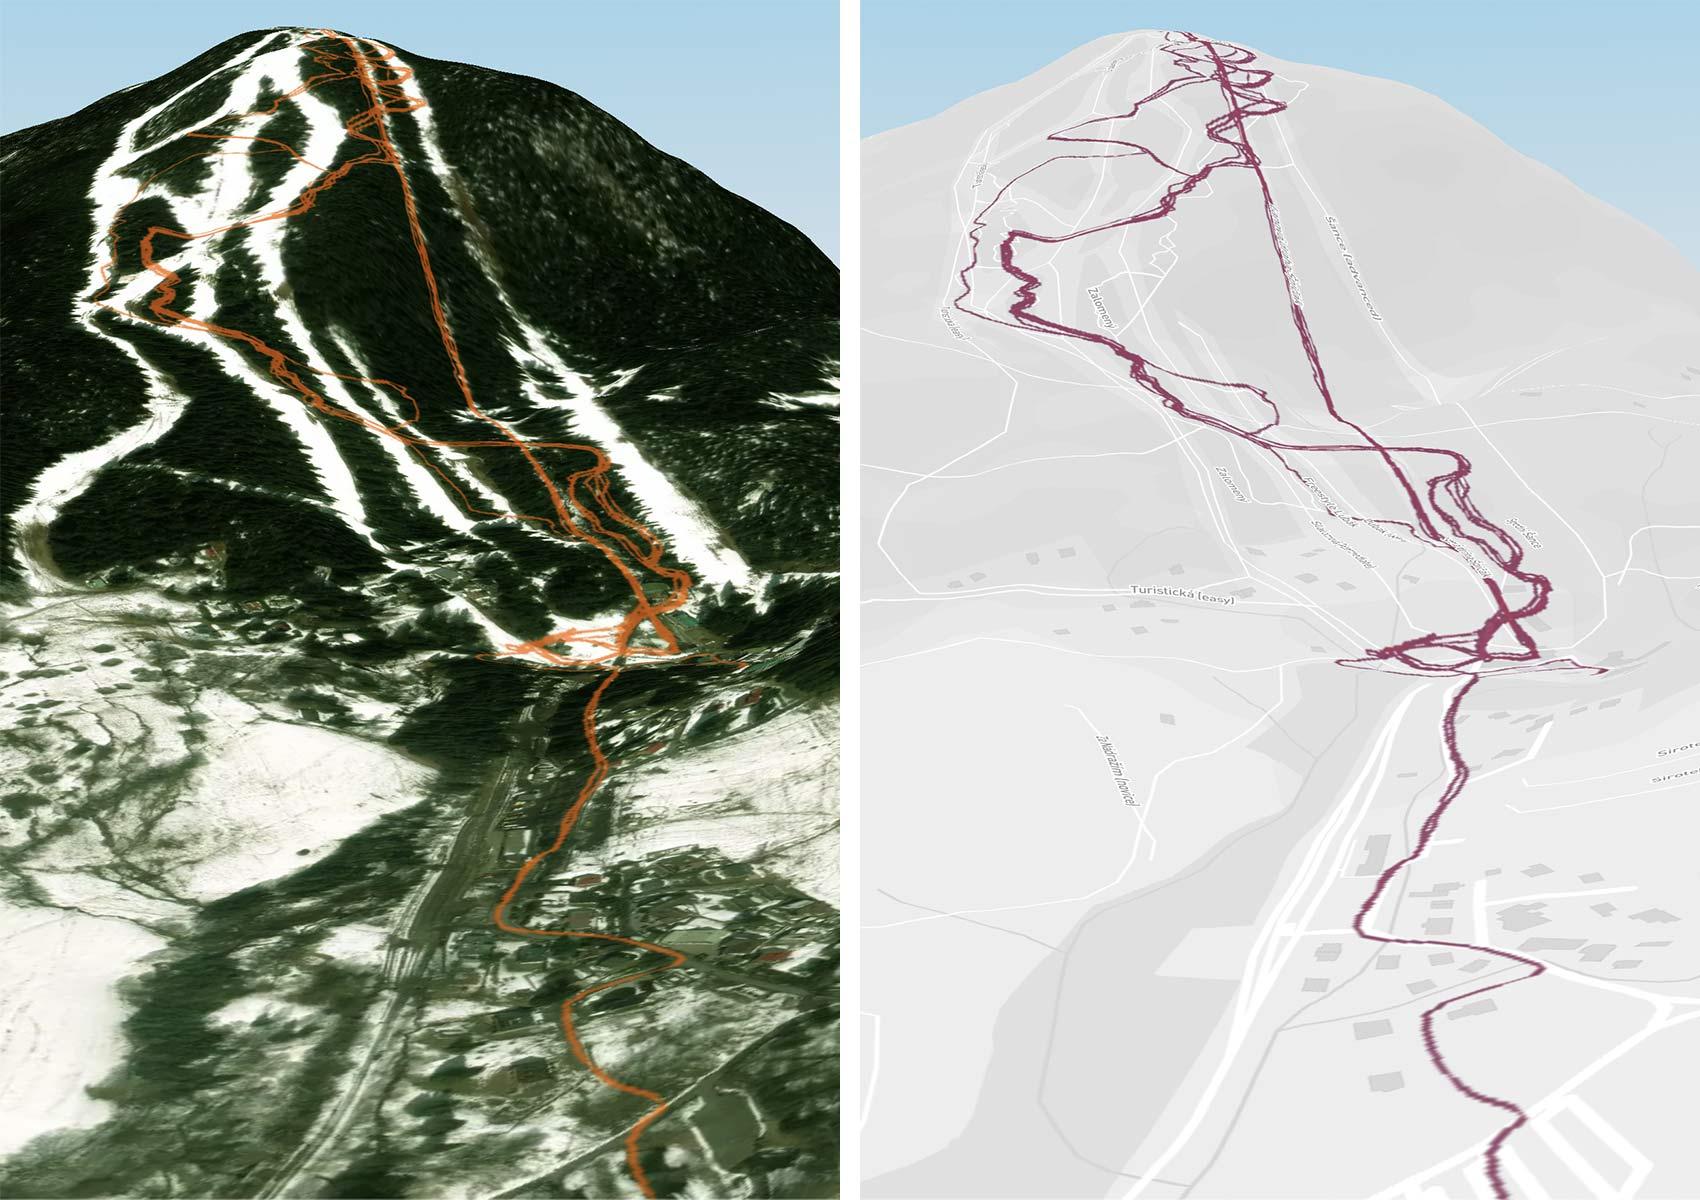 Strava 3D Heatmaps, strava premium subscription activity ride data 3D terrain map overlay,Spicak